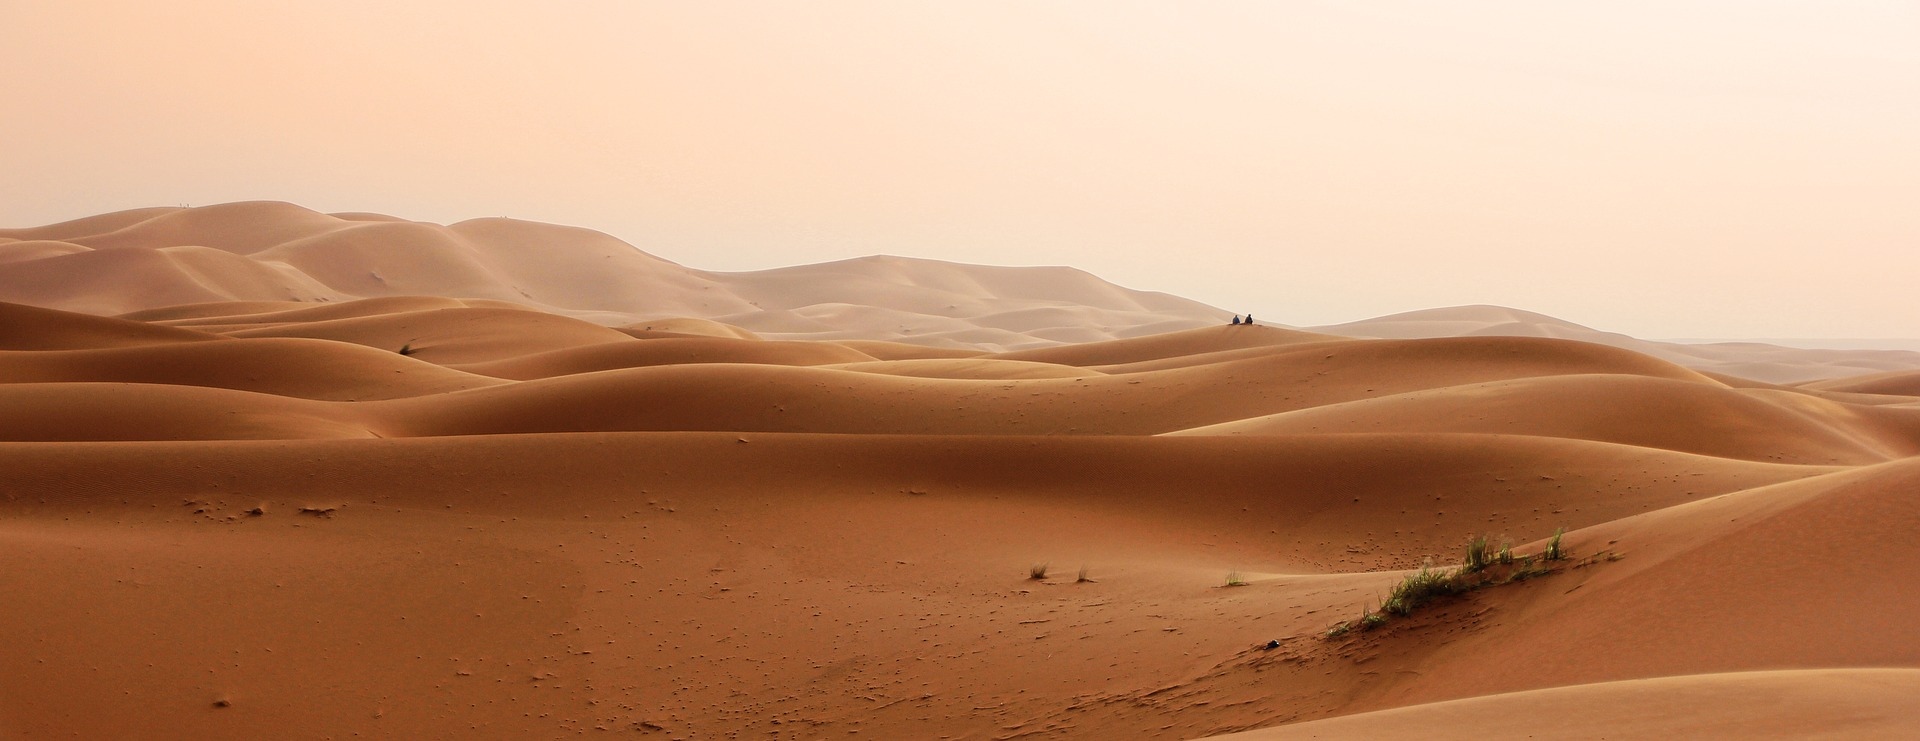 Scheinbar endlose Sahara